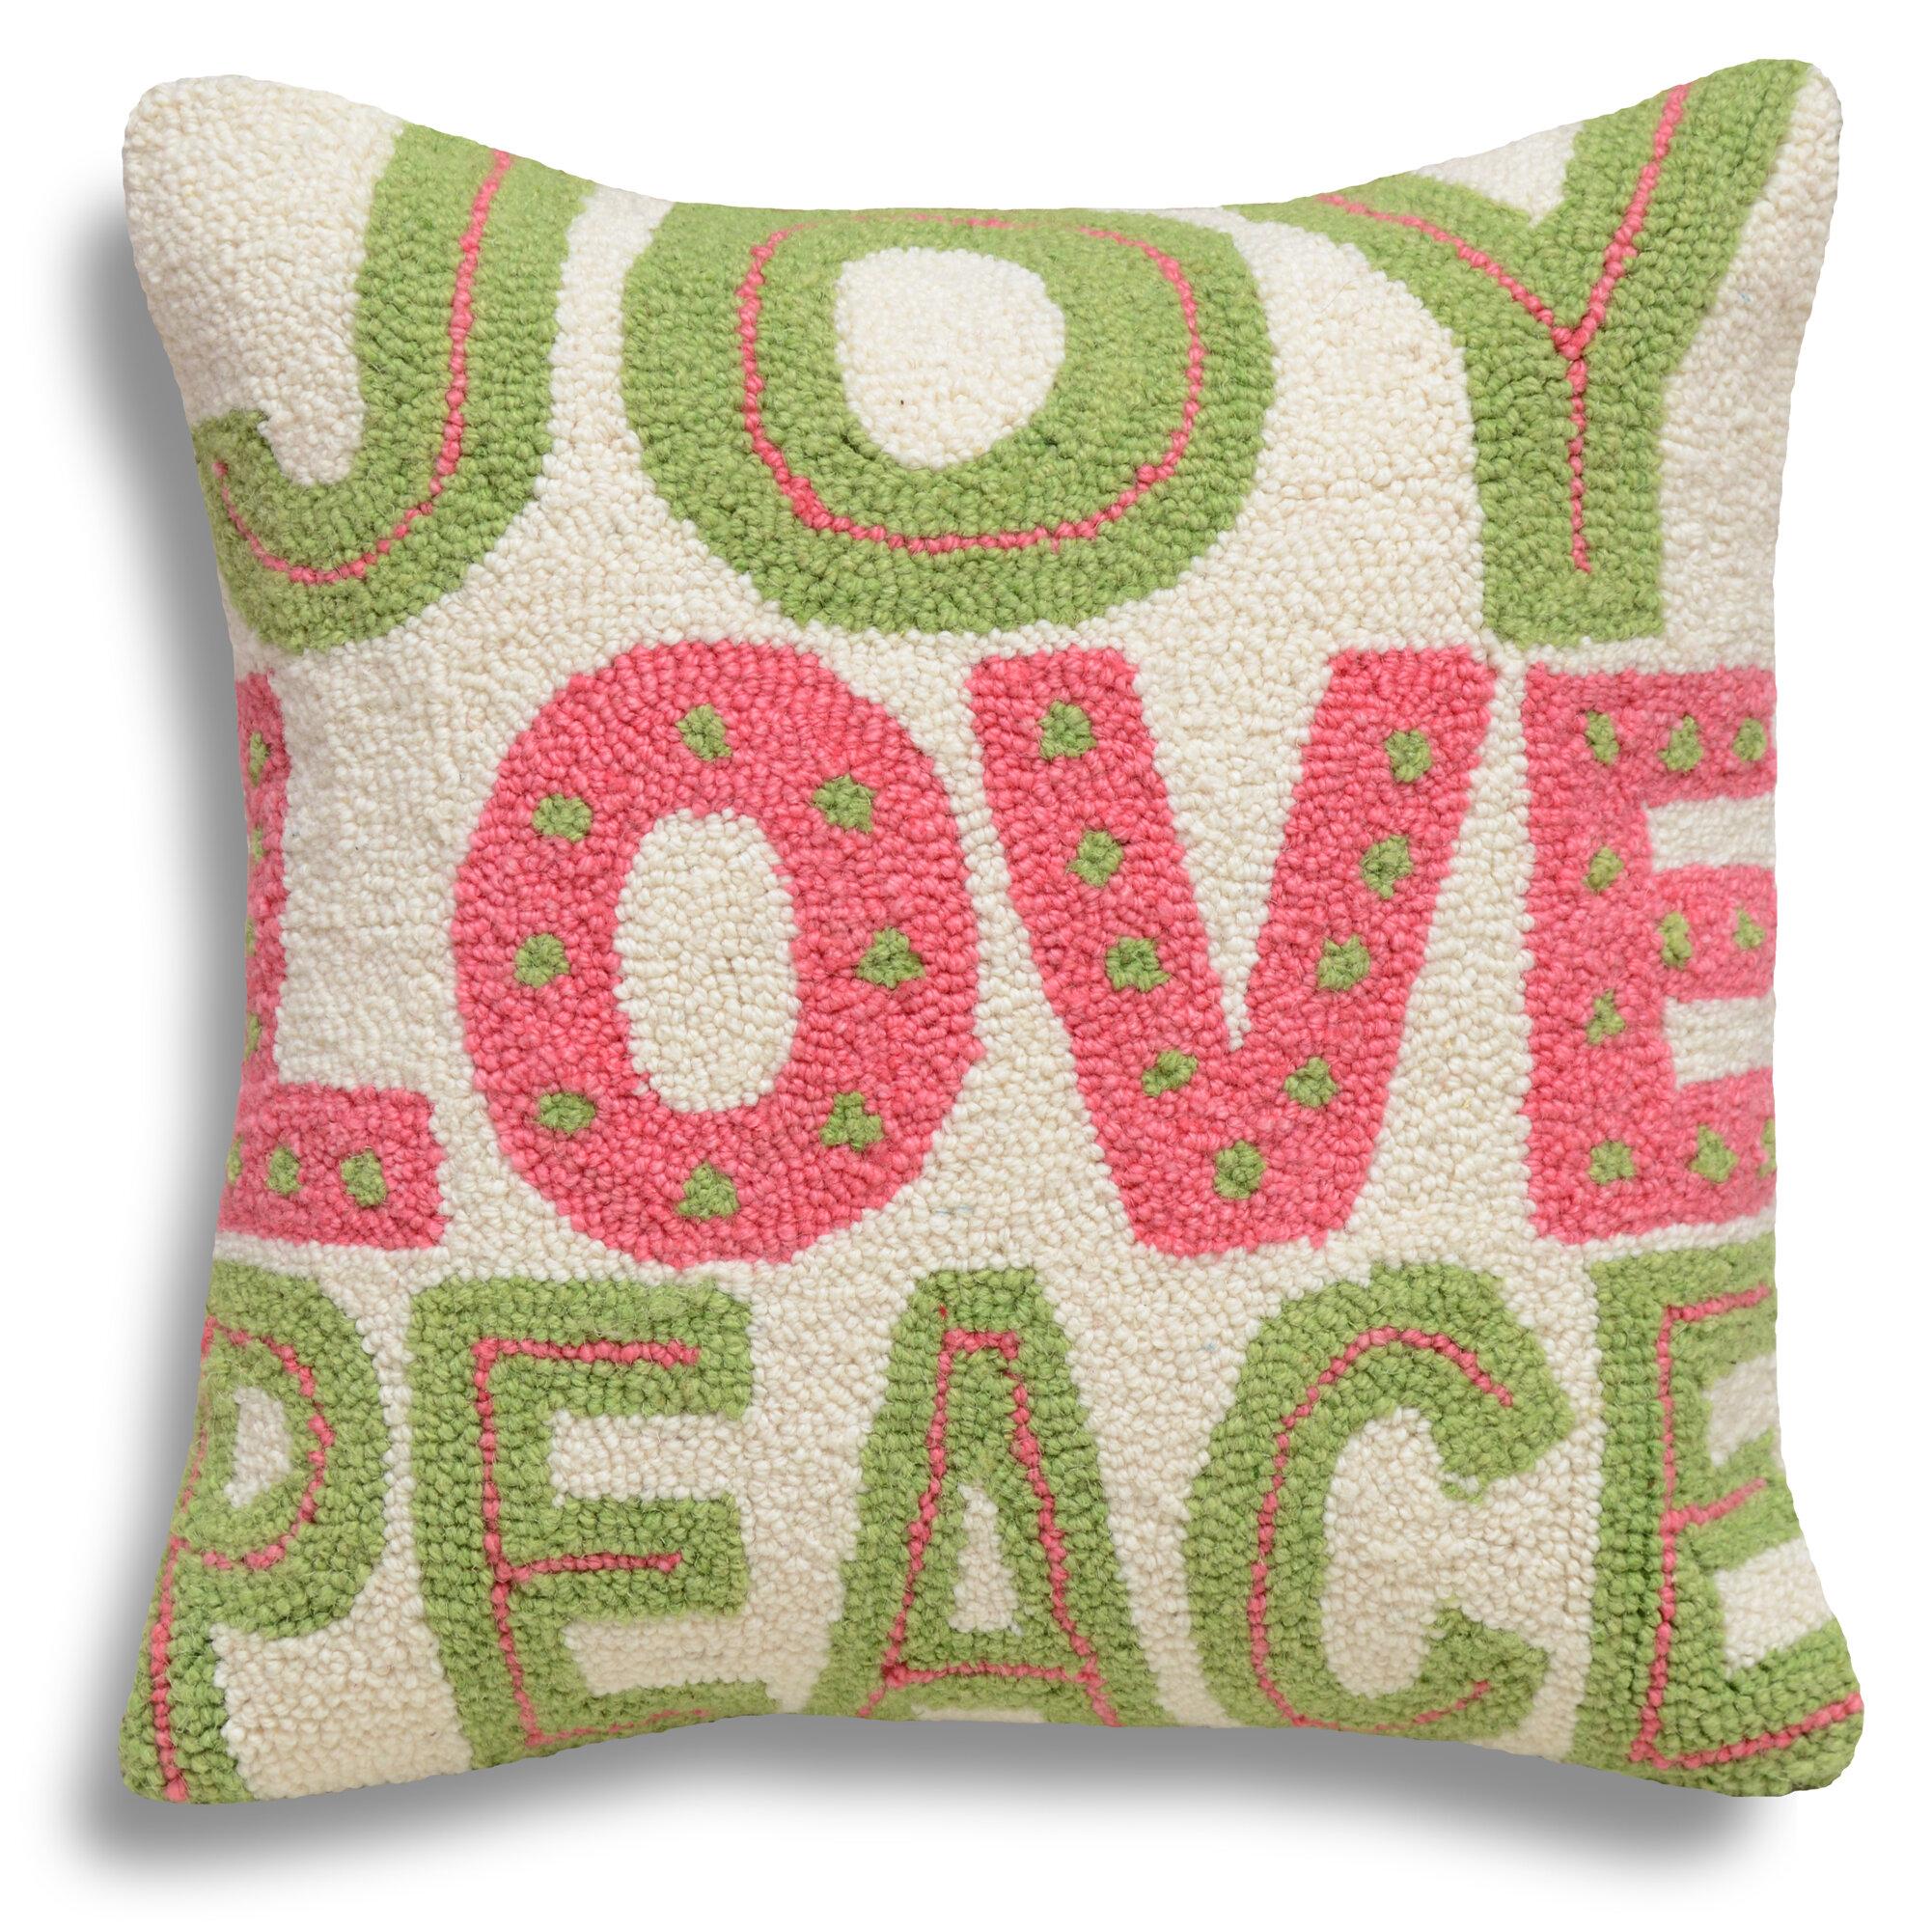 123 Creations Joy Love Peace Wool Throw Pillow Reviews Wayfair